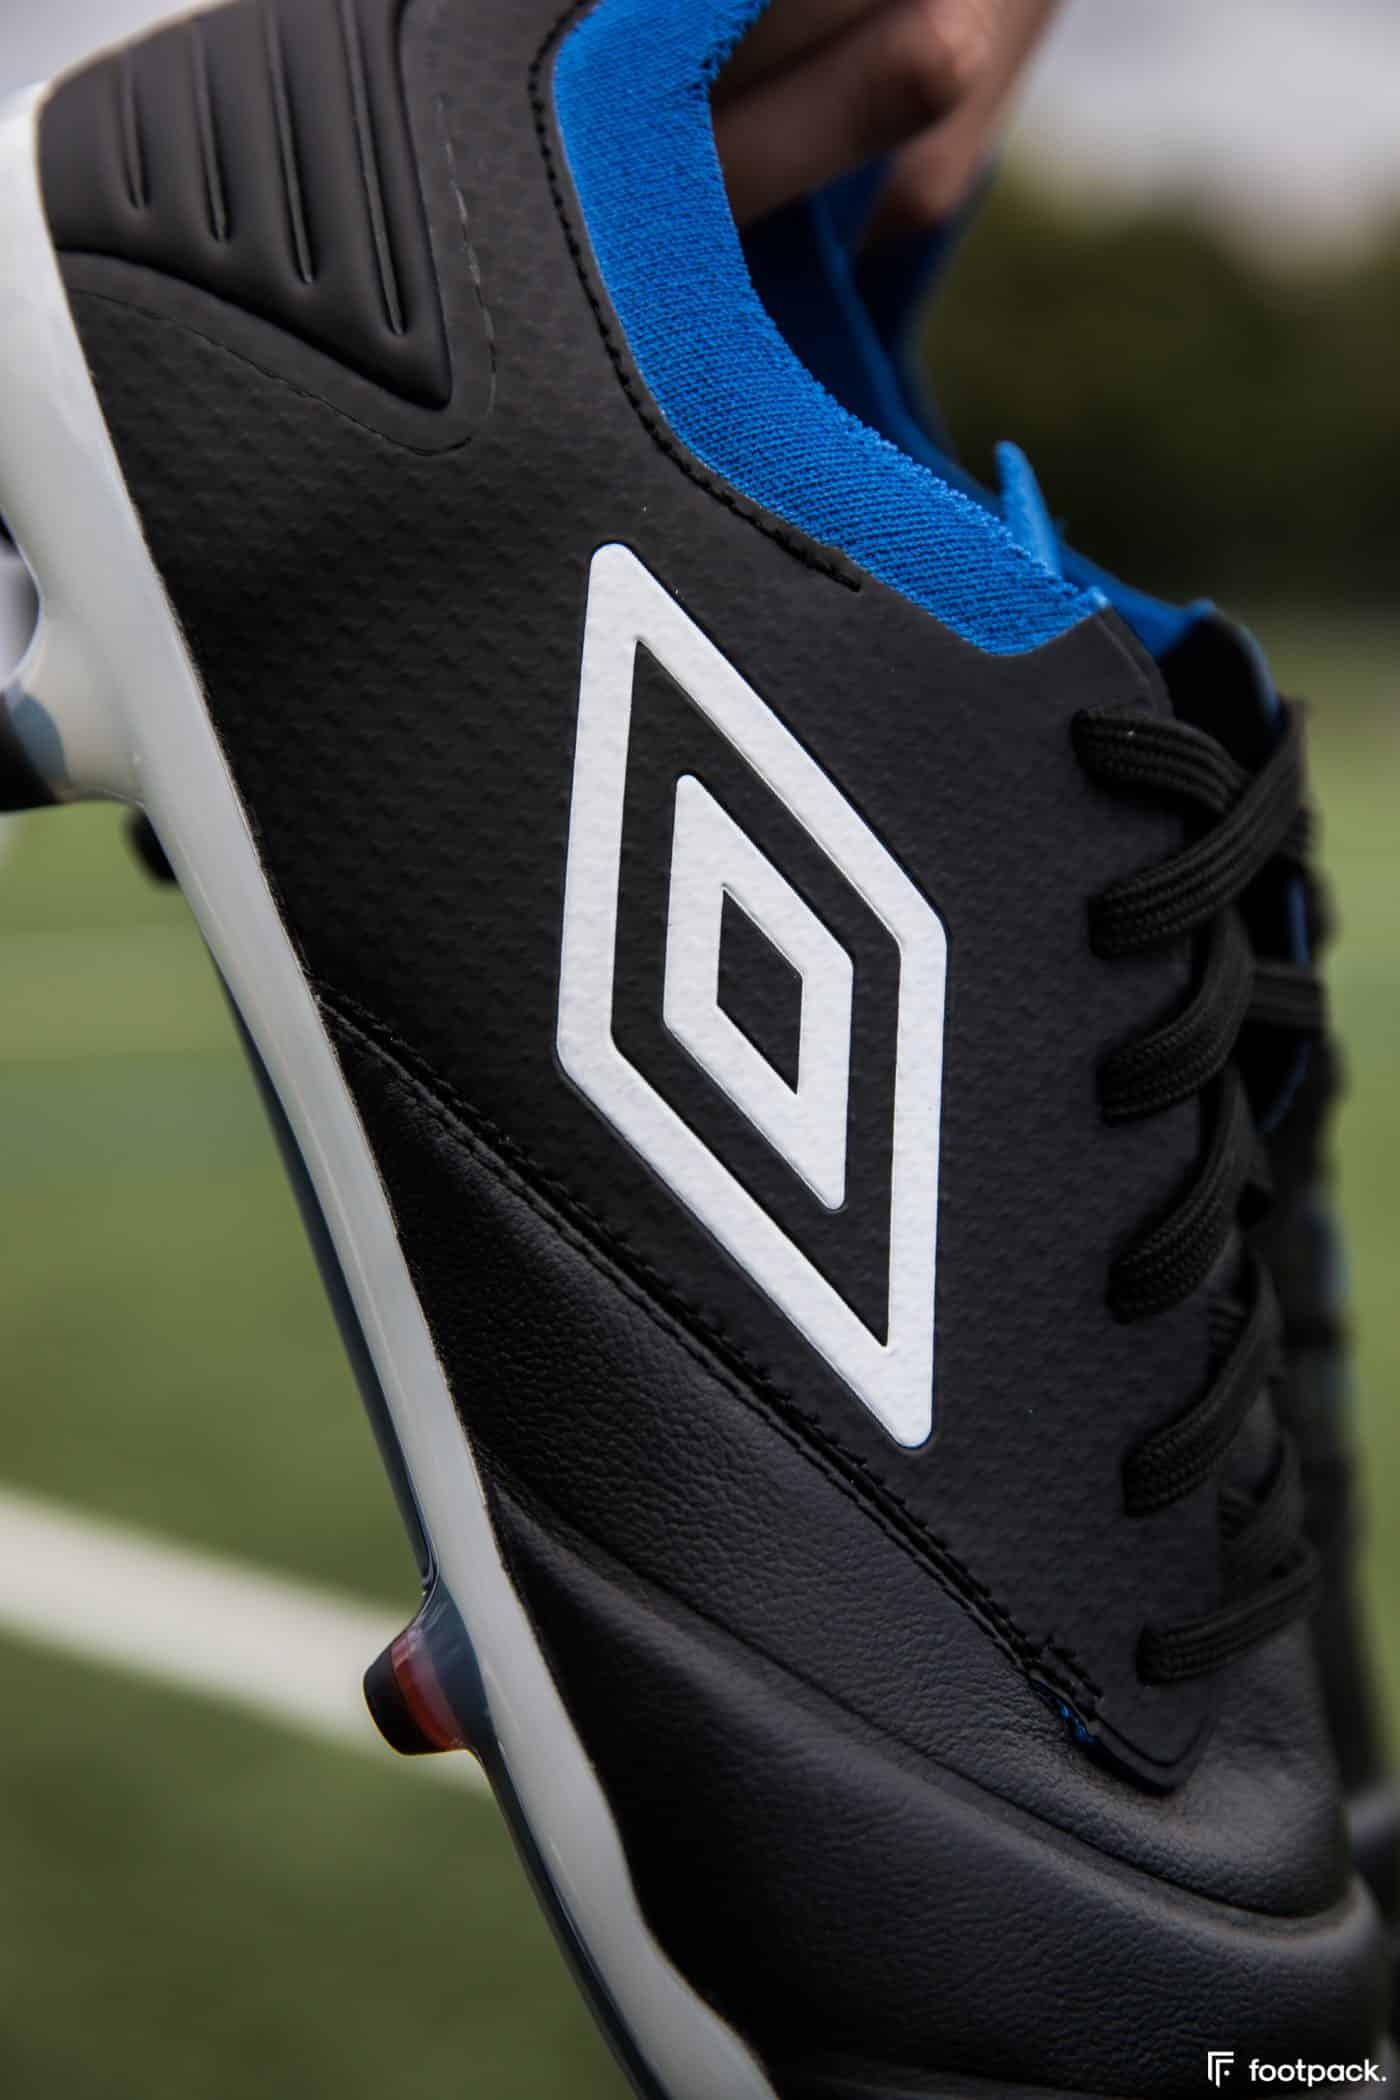 umbro-tocco-noir-bleu-2020-footpack-15